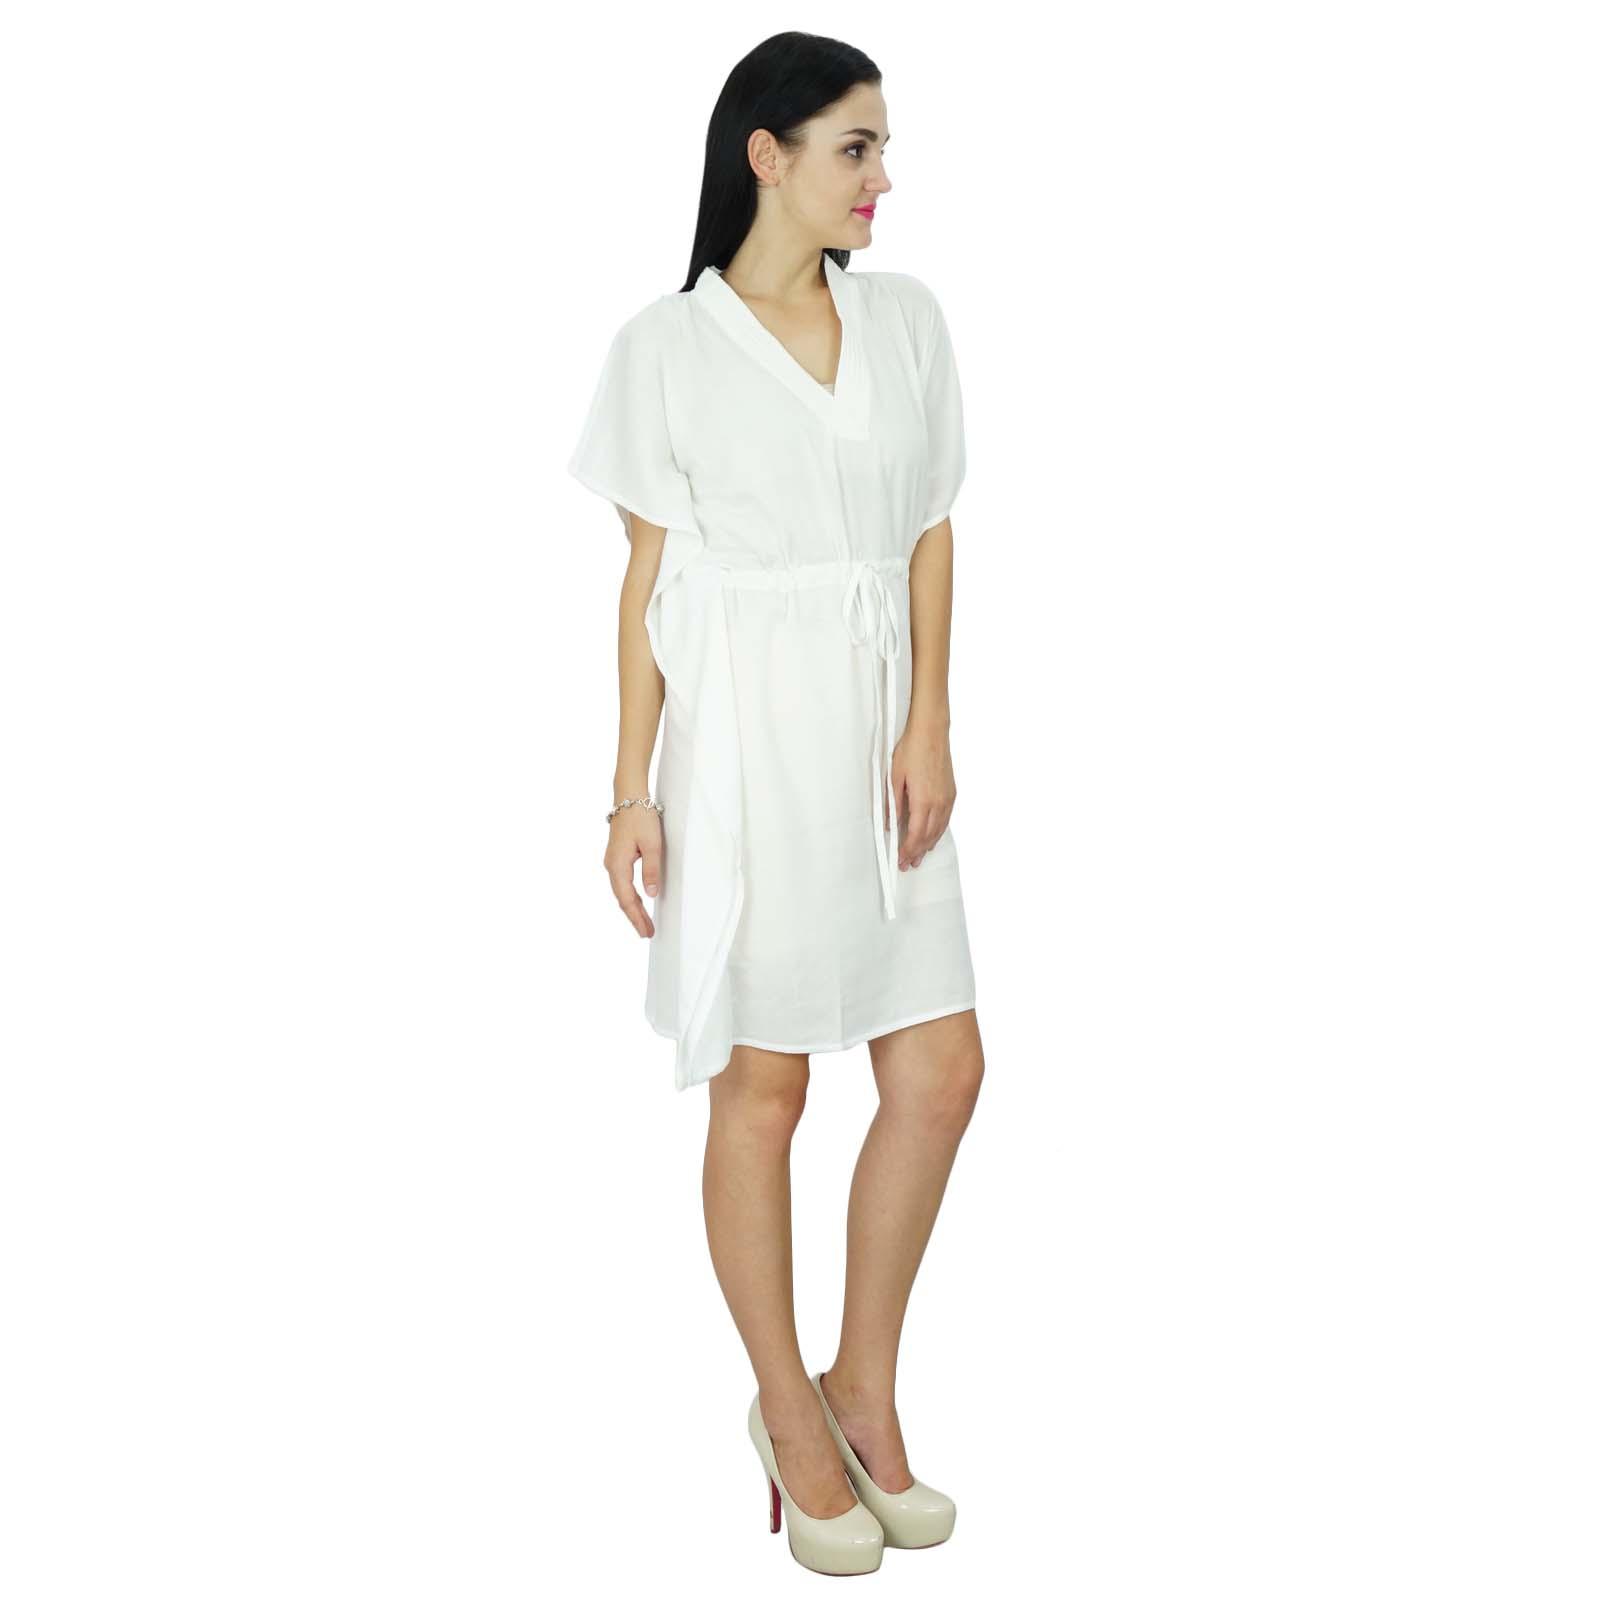 thumbnail 38 - Bimba Women Plain Kaftan Dress Beach Cover Up Cotton Solid Caftan-58z